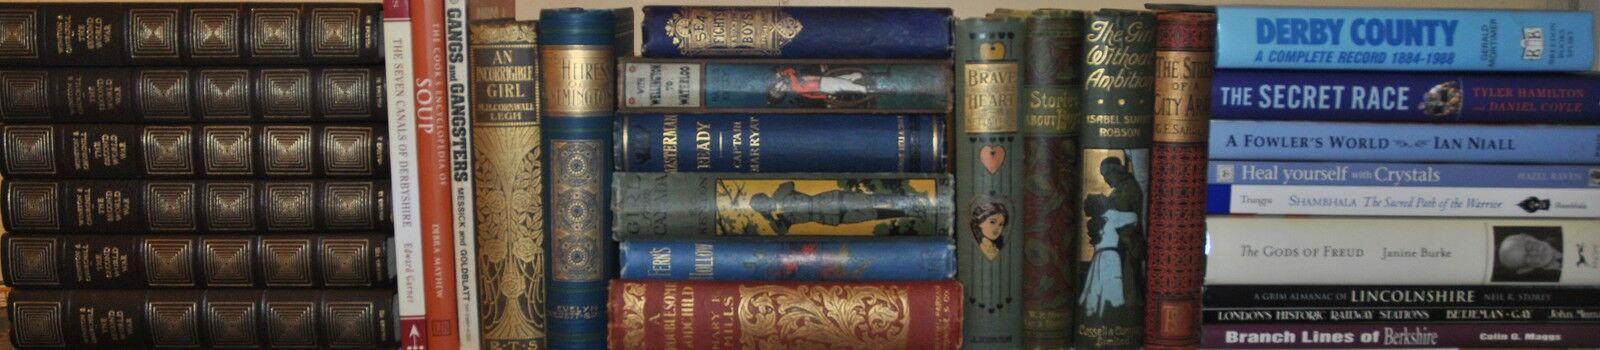 derventio books